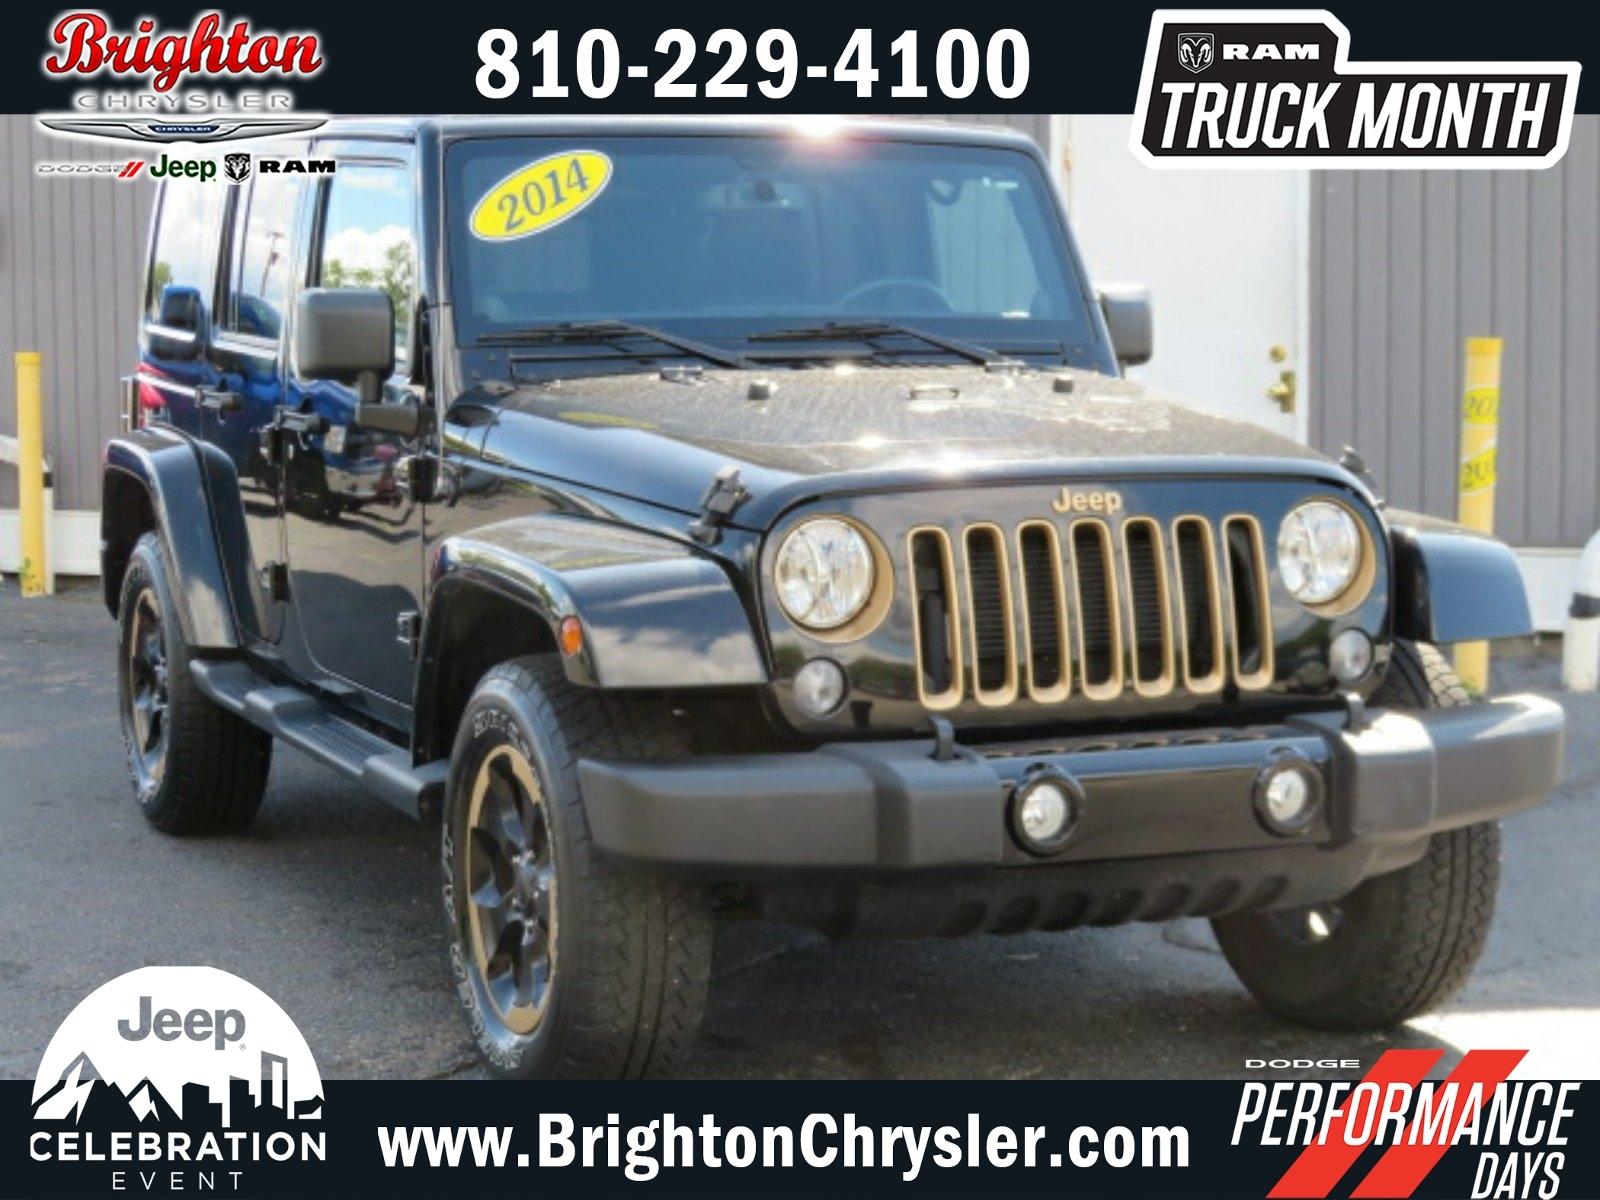 2014 Jeep Wrangler Unlimited Dragon Edition 4WD  Dragon Edition *Ltd Avail*